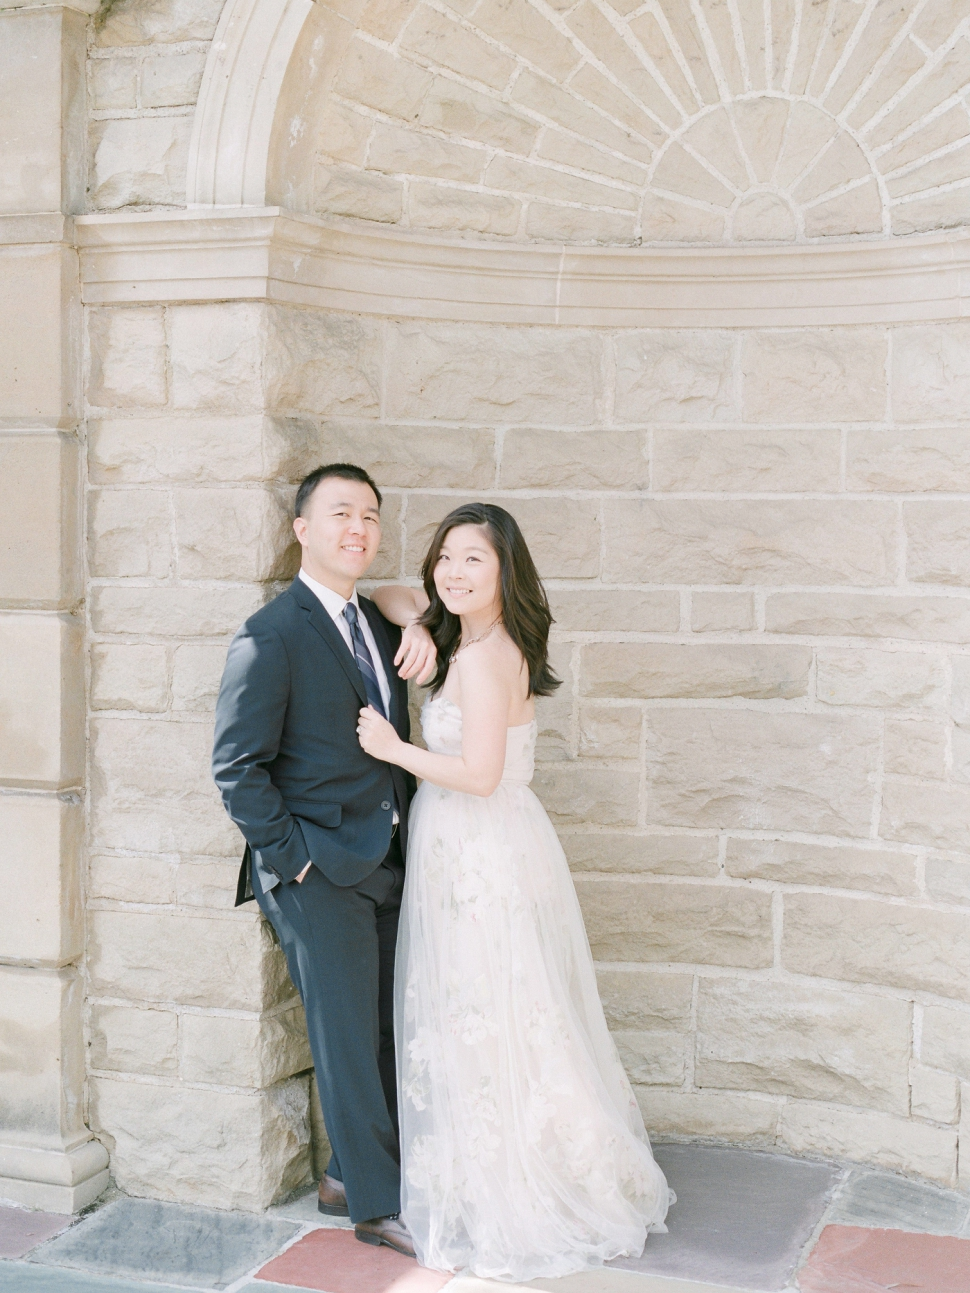 Southern-California-Wedding-Photographer-Cassi-Claire-Greystone-Mansion-Beverly-Hills-CA-wedding_14.jpg